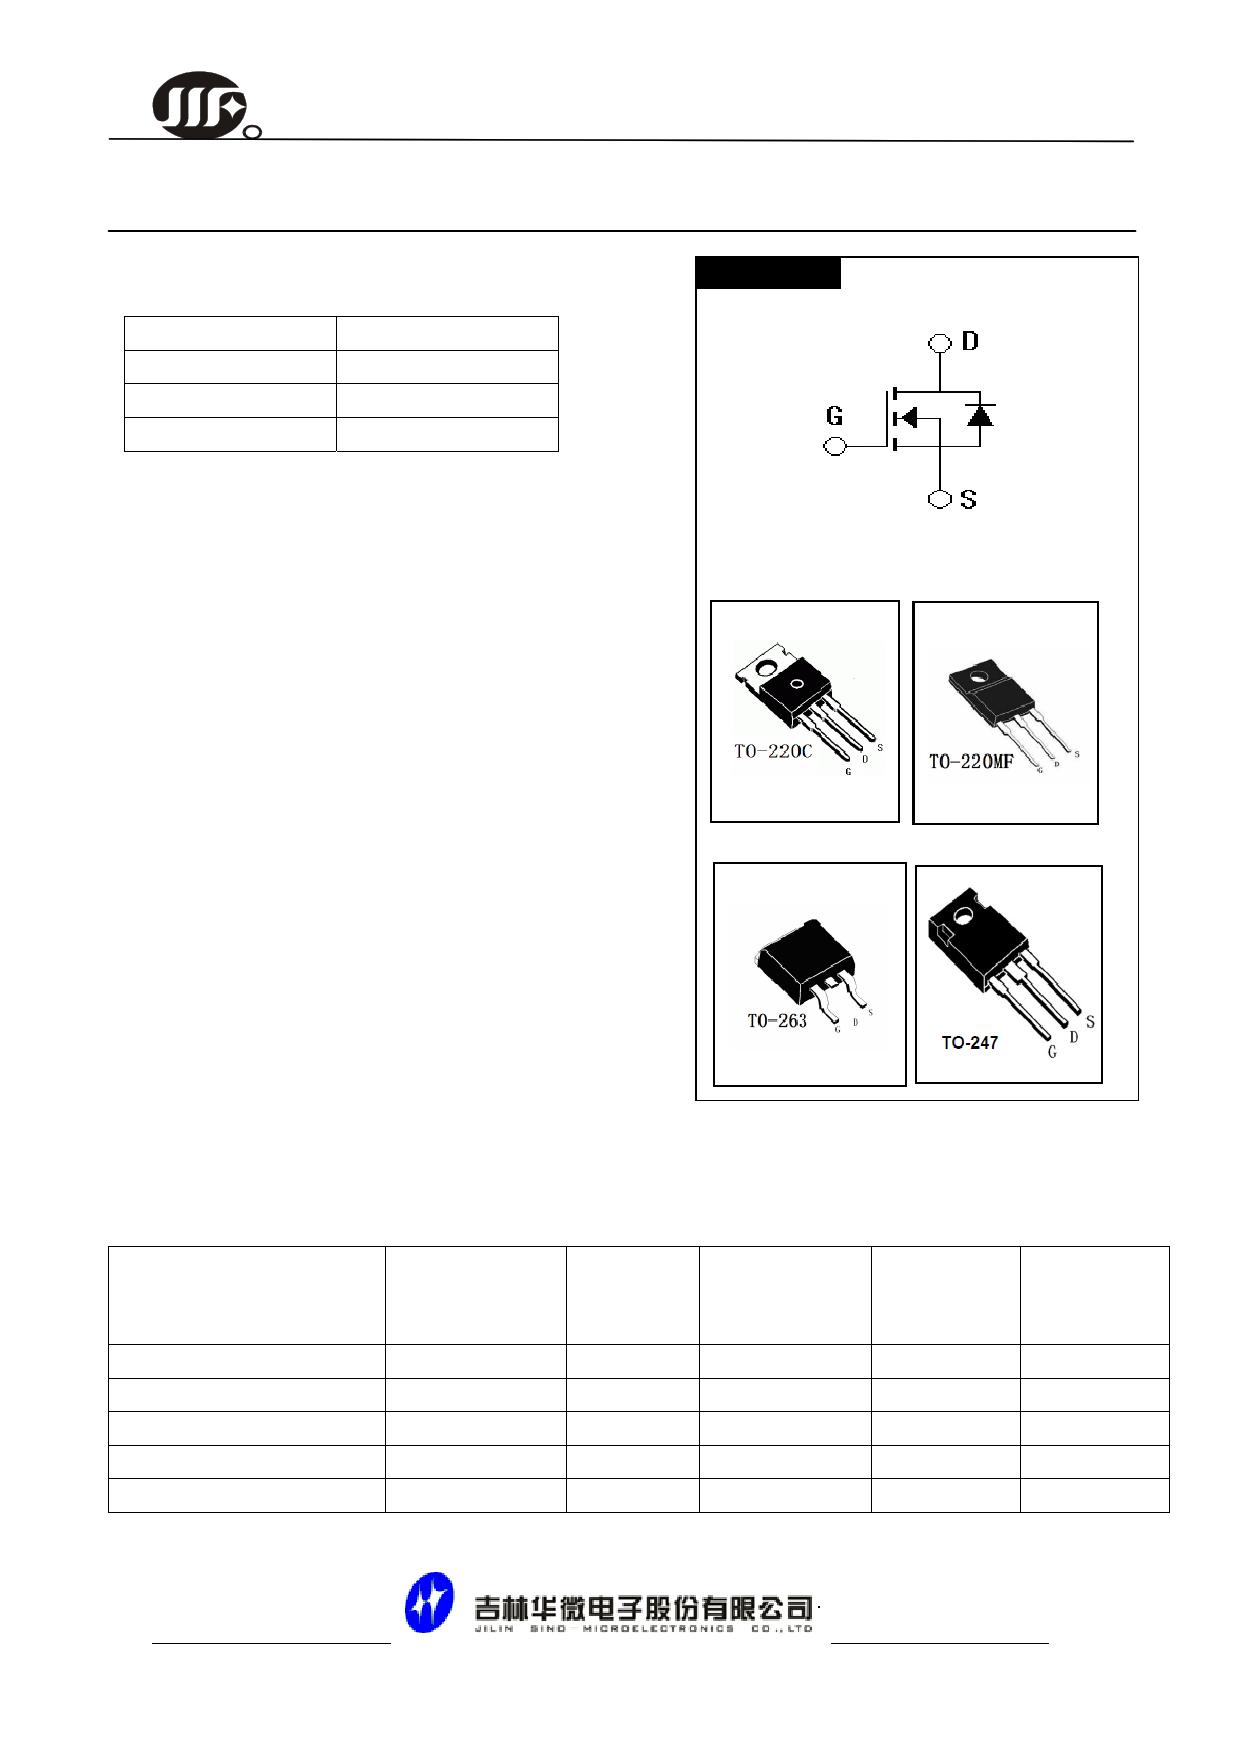 JCS80N10WF datasheet